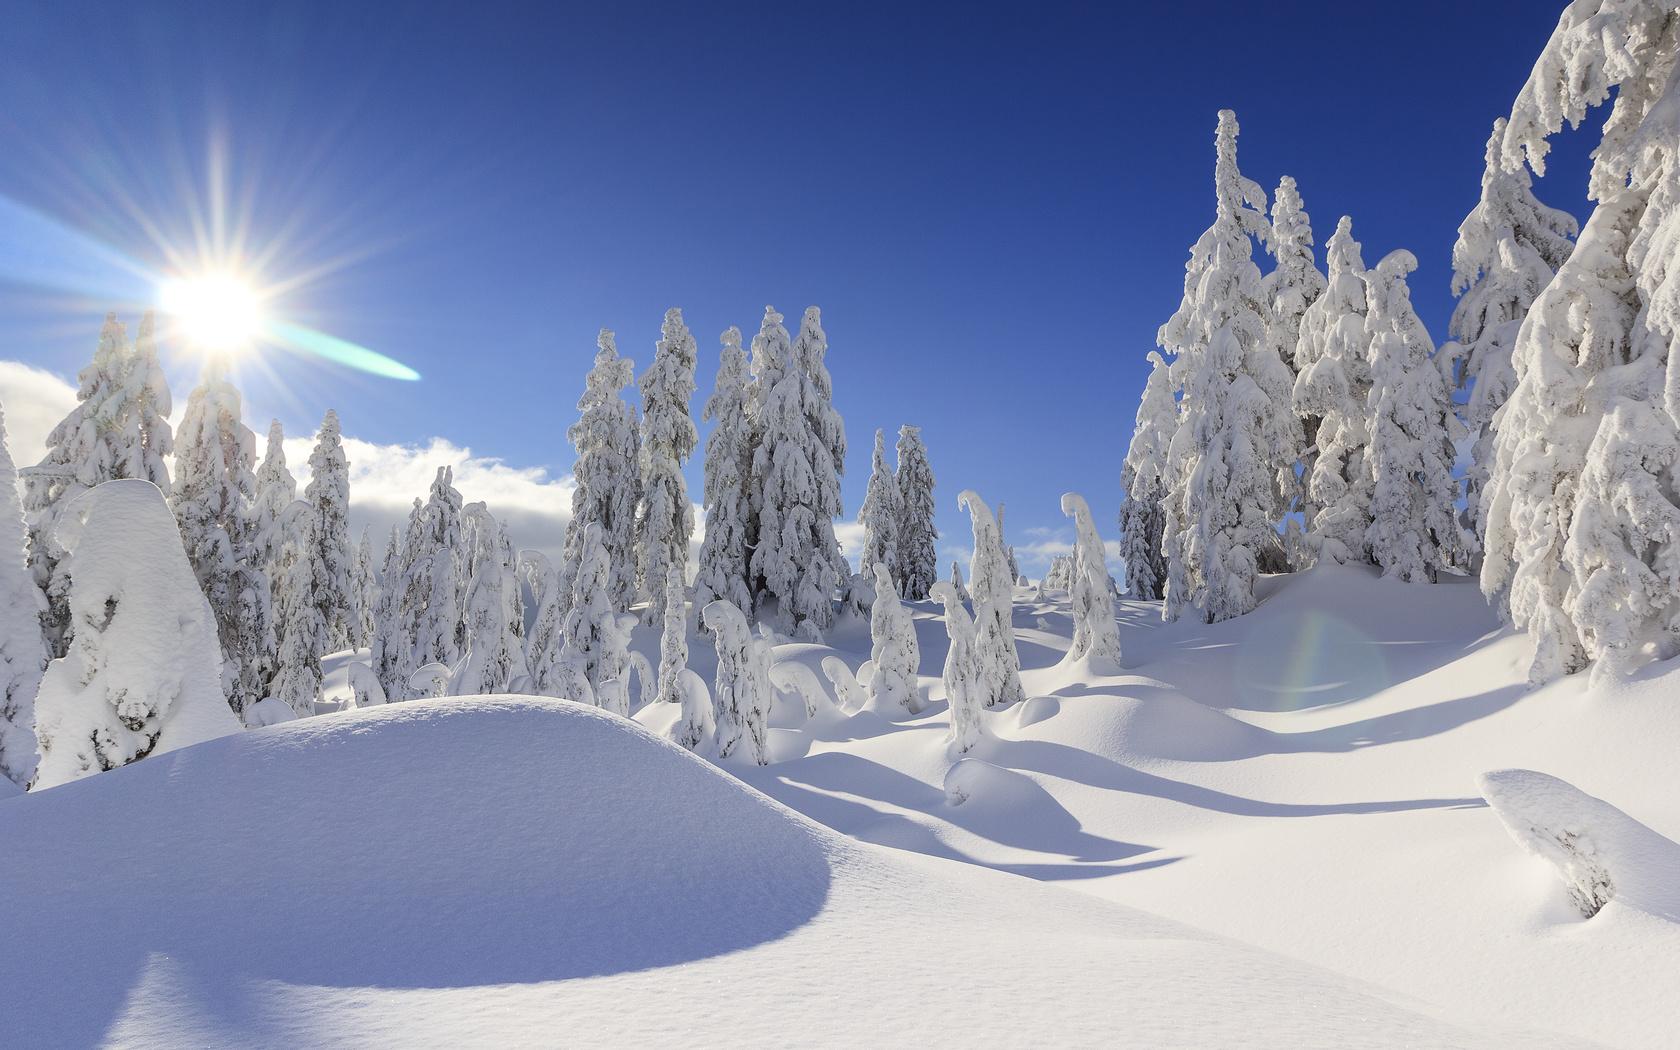 зима, .канада, ванкувер, снег, сугробы, солнце, лучи, ели, канада